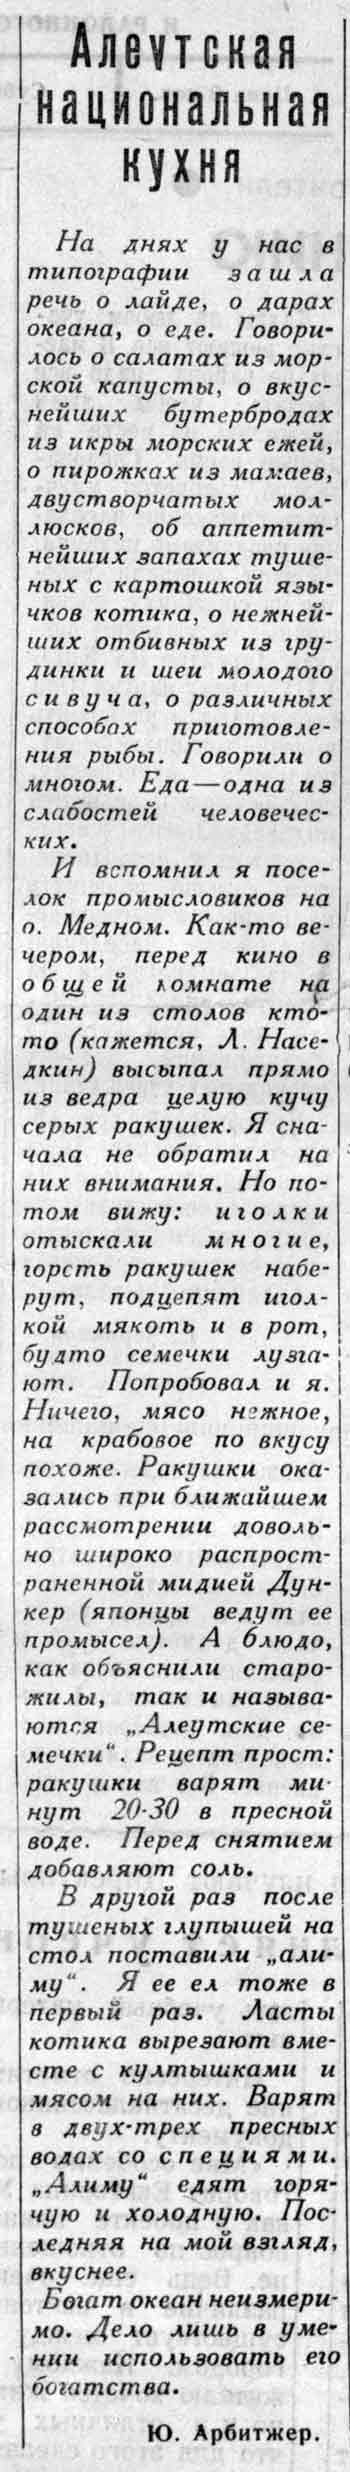 az-1971-23,20-03